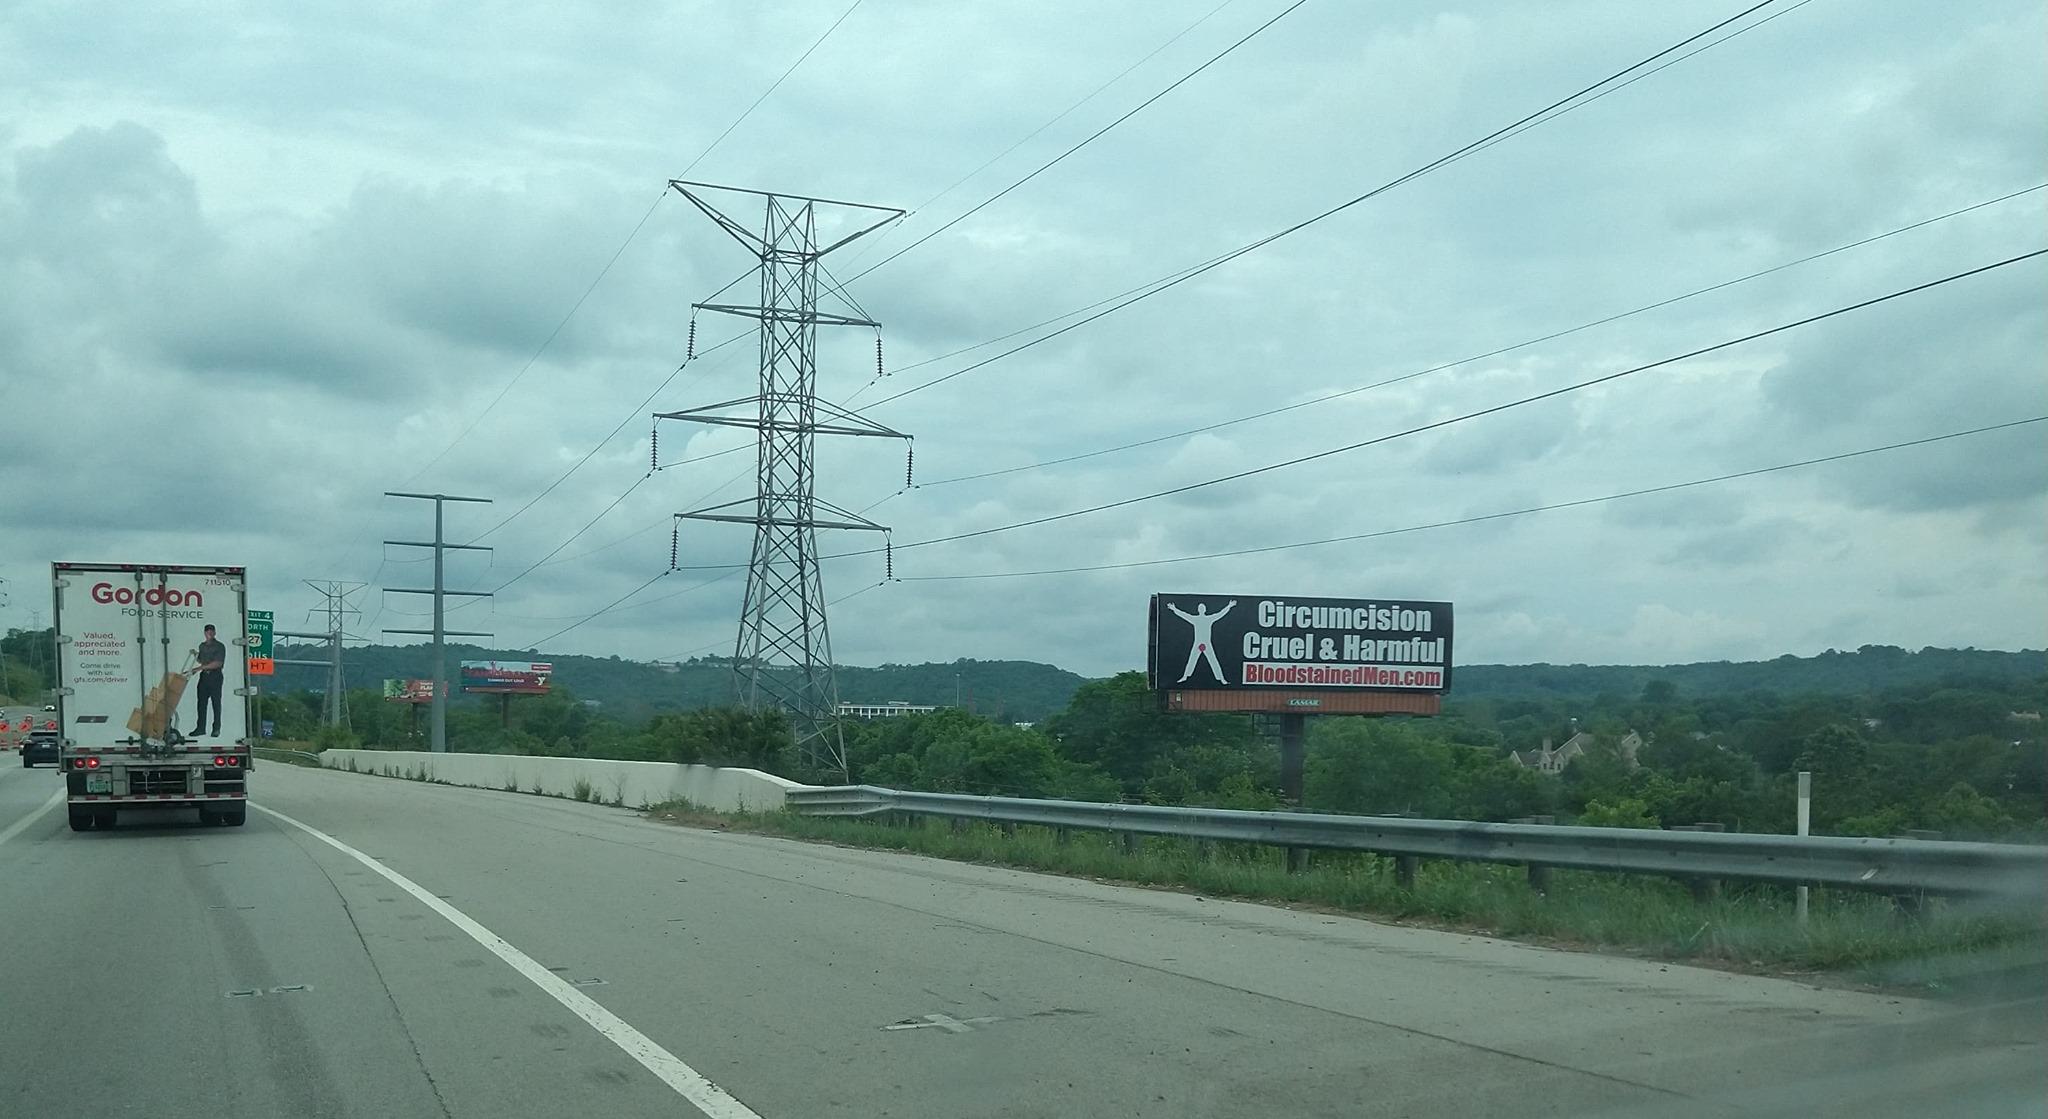 Cincinnati Billboard – Circumcision: Cruel & Harmful